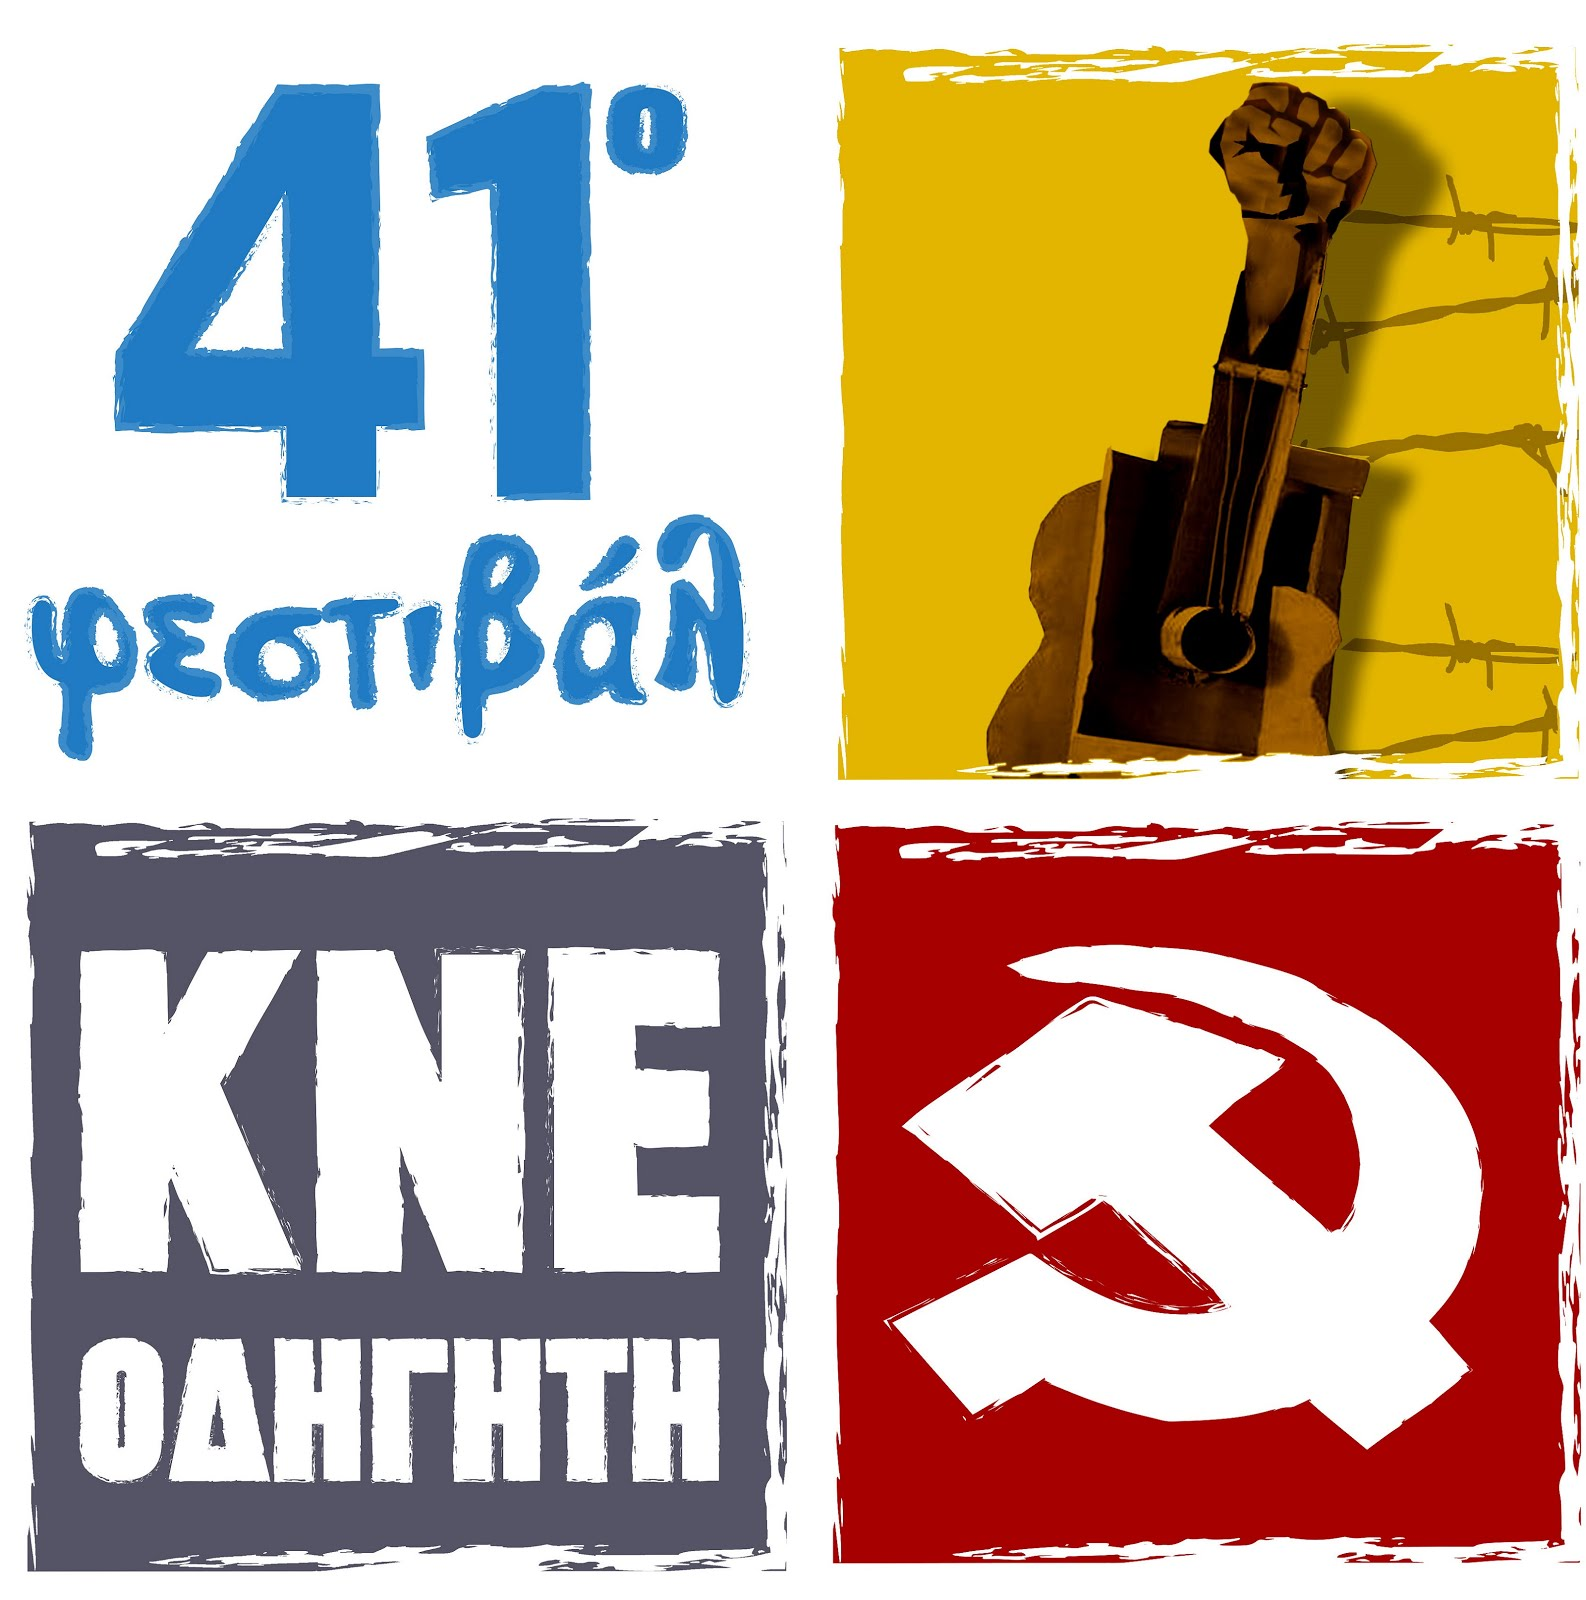 "41o Φεστιβάλ ΚΝΕ - ΟΔΗΓΗΤΗ ( 17,18 & 19 Σεπτέμβρη 2015 - ""Πάρκο Τρίτση"" )"